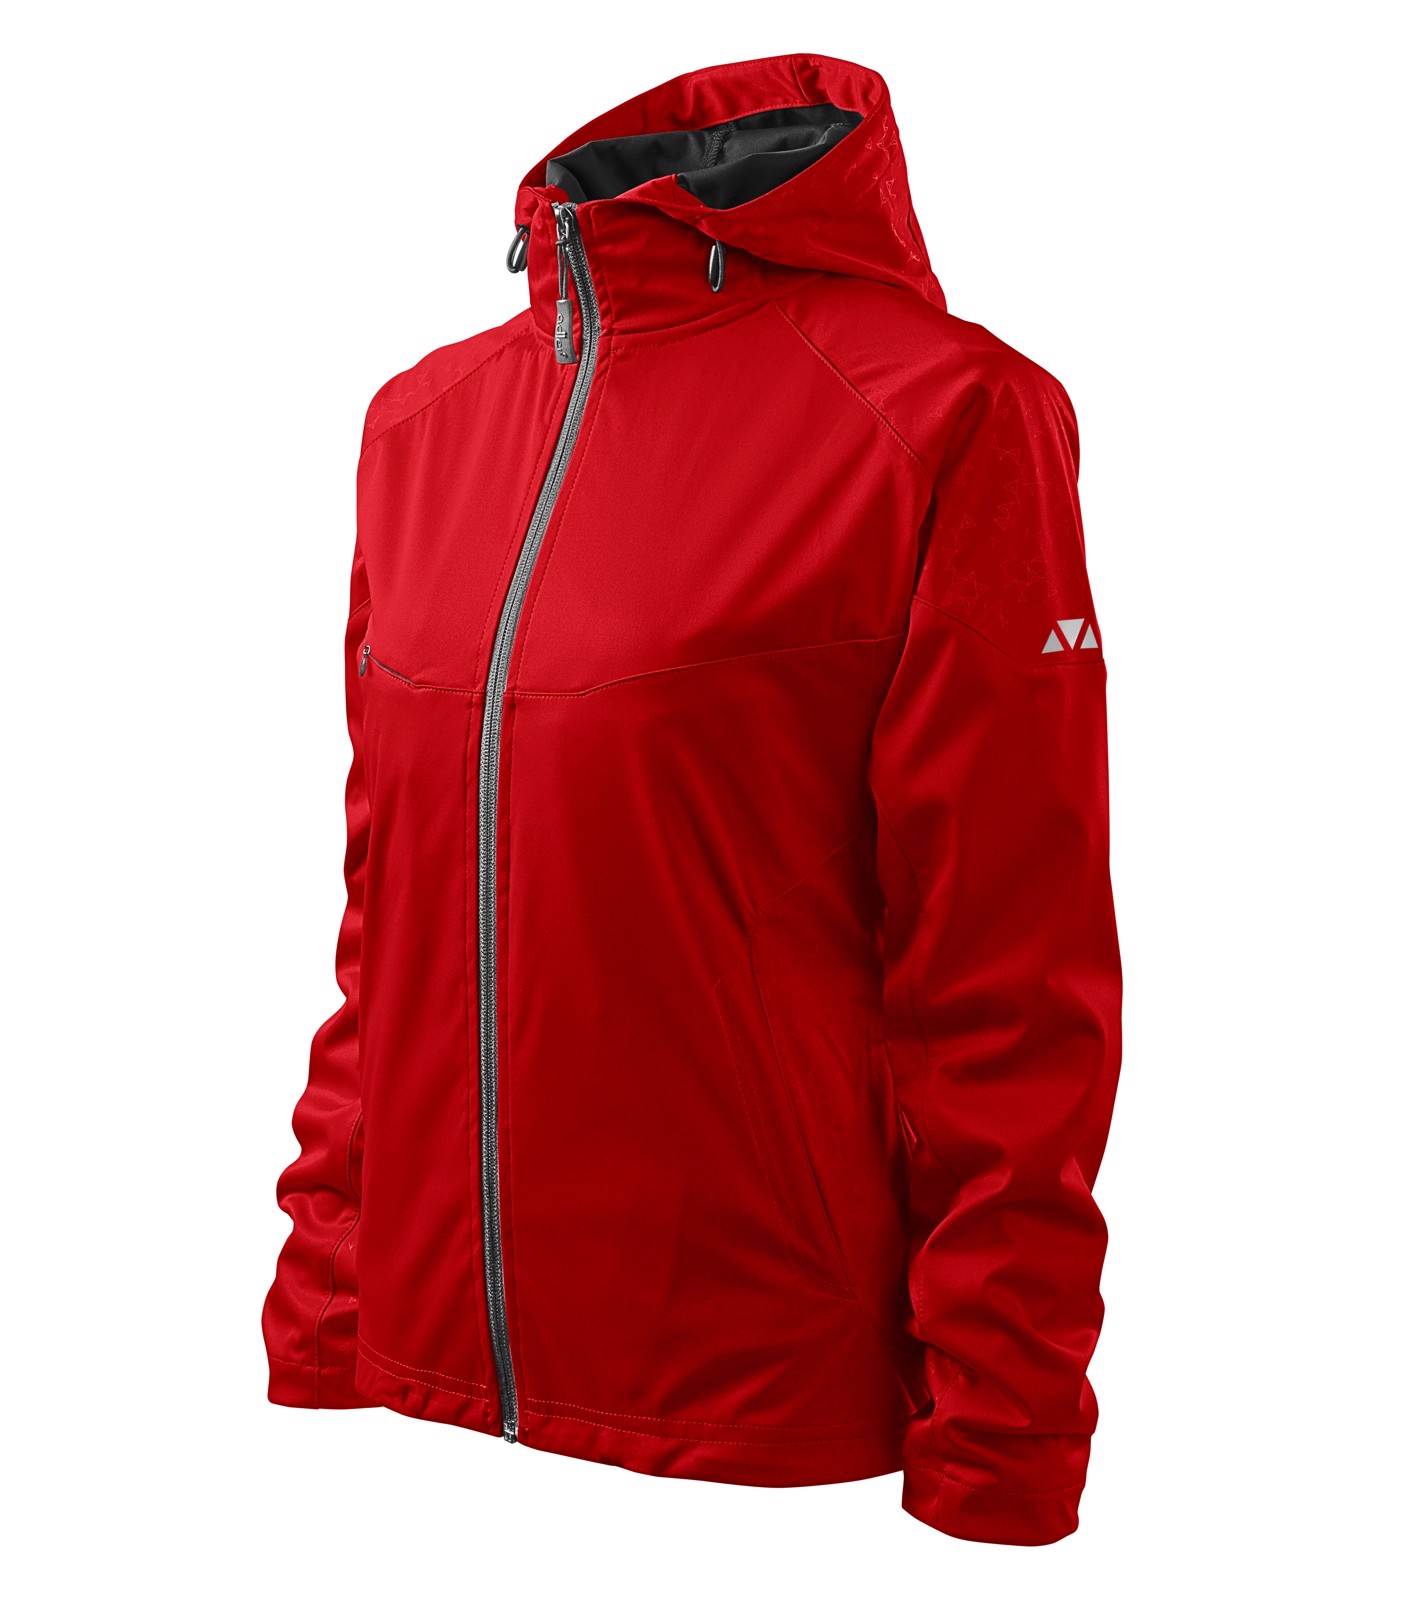 Softshell Jacket women's Malfini Cool - Red / M